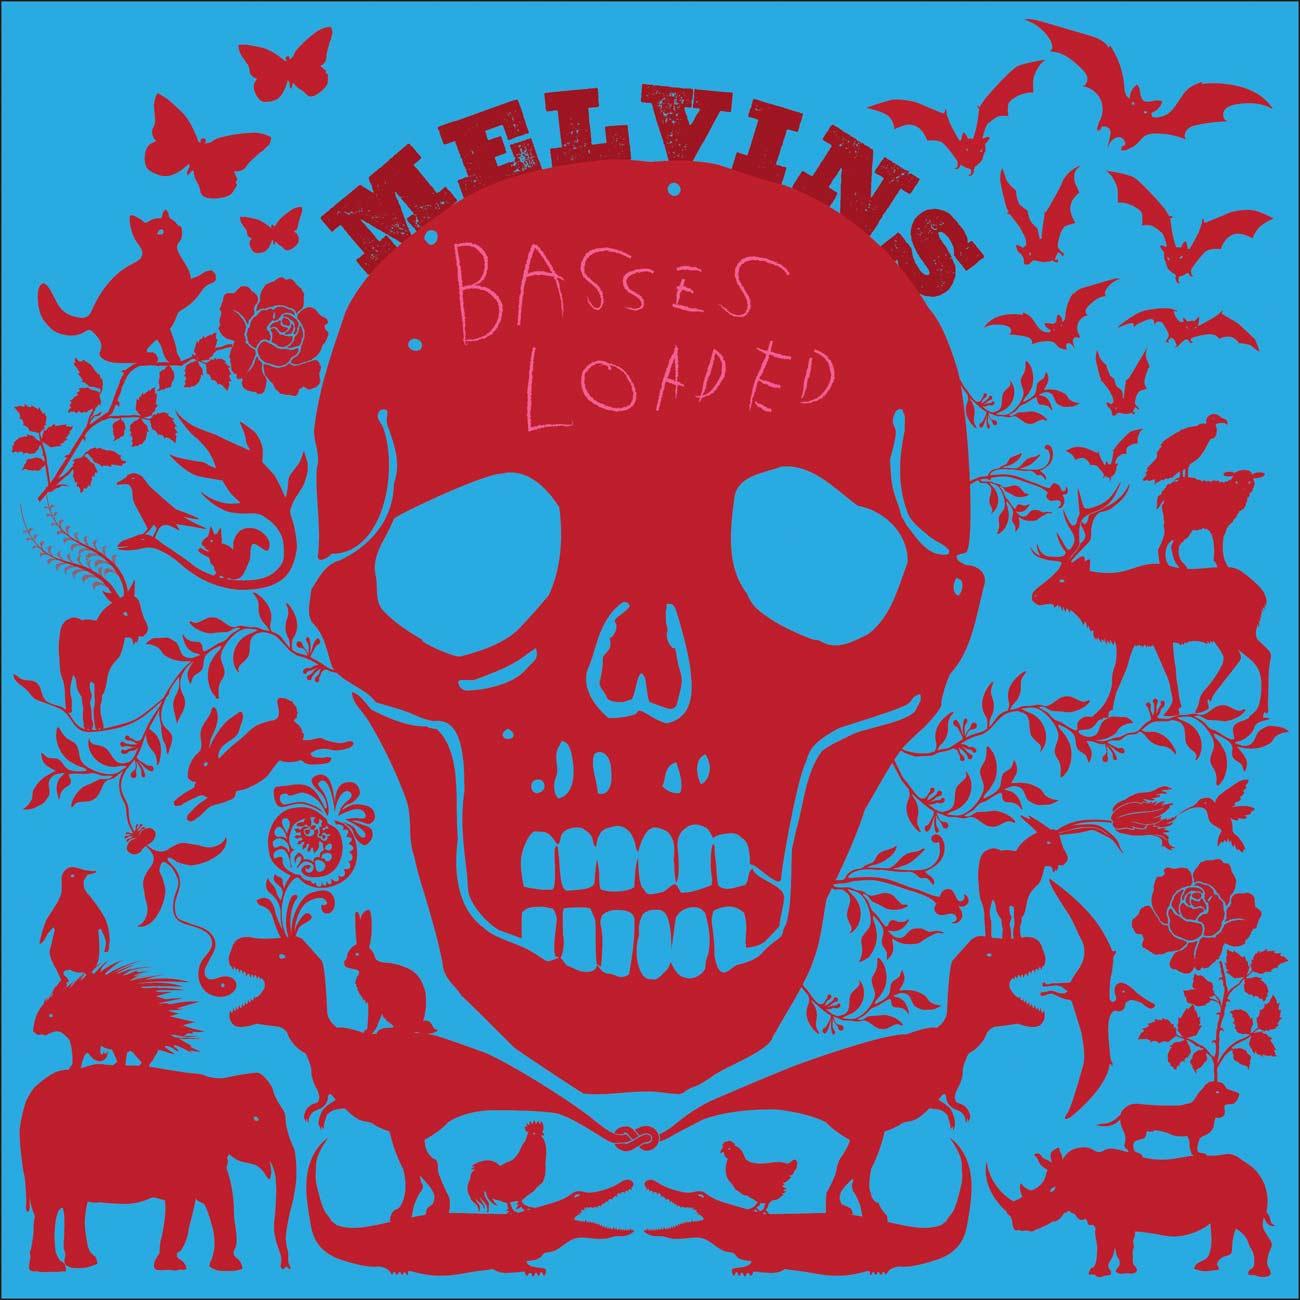 The Melvins Album Covers